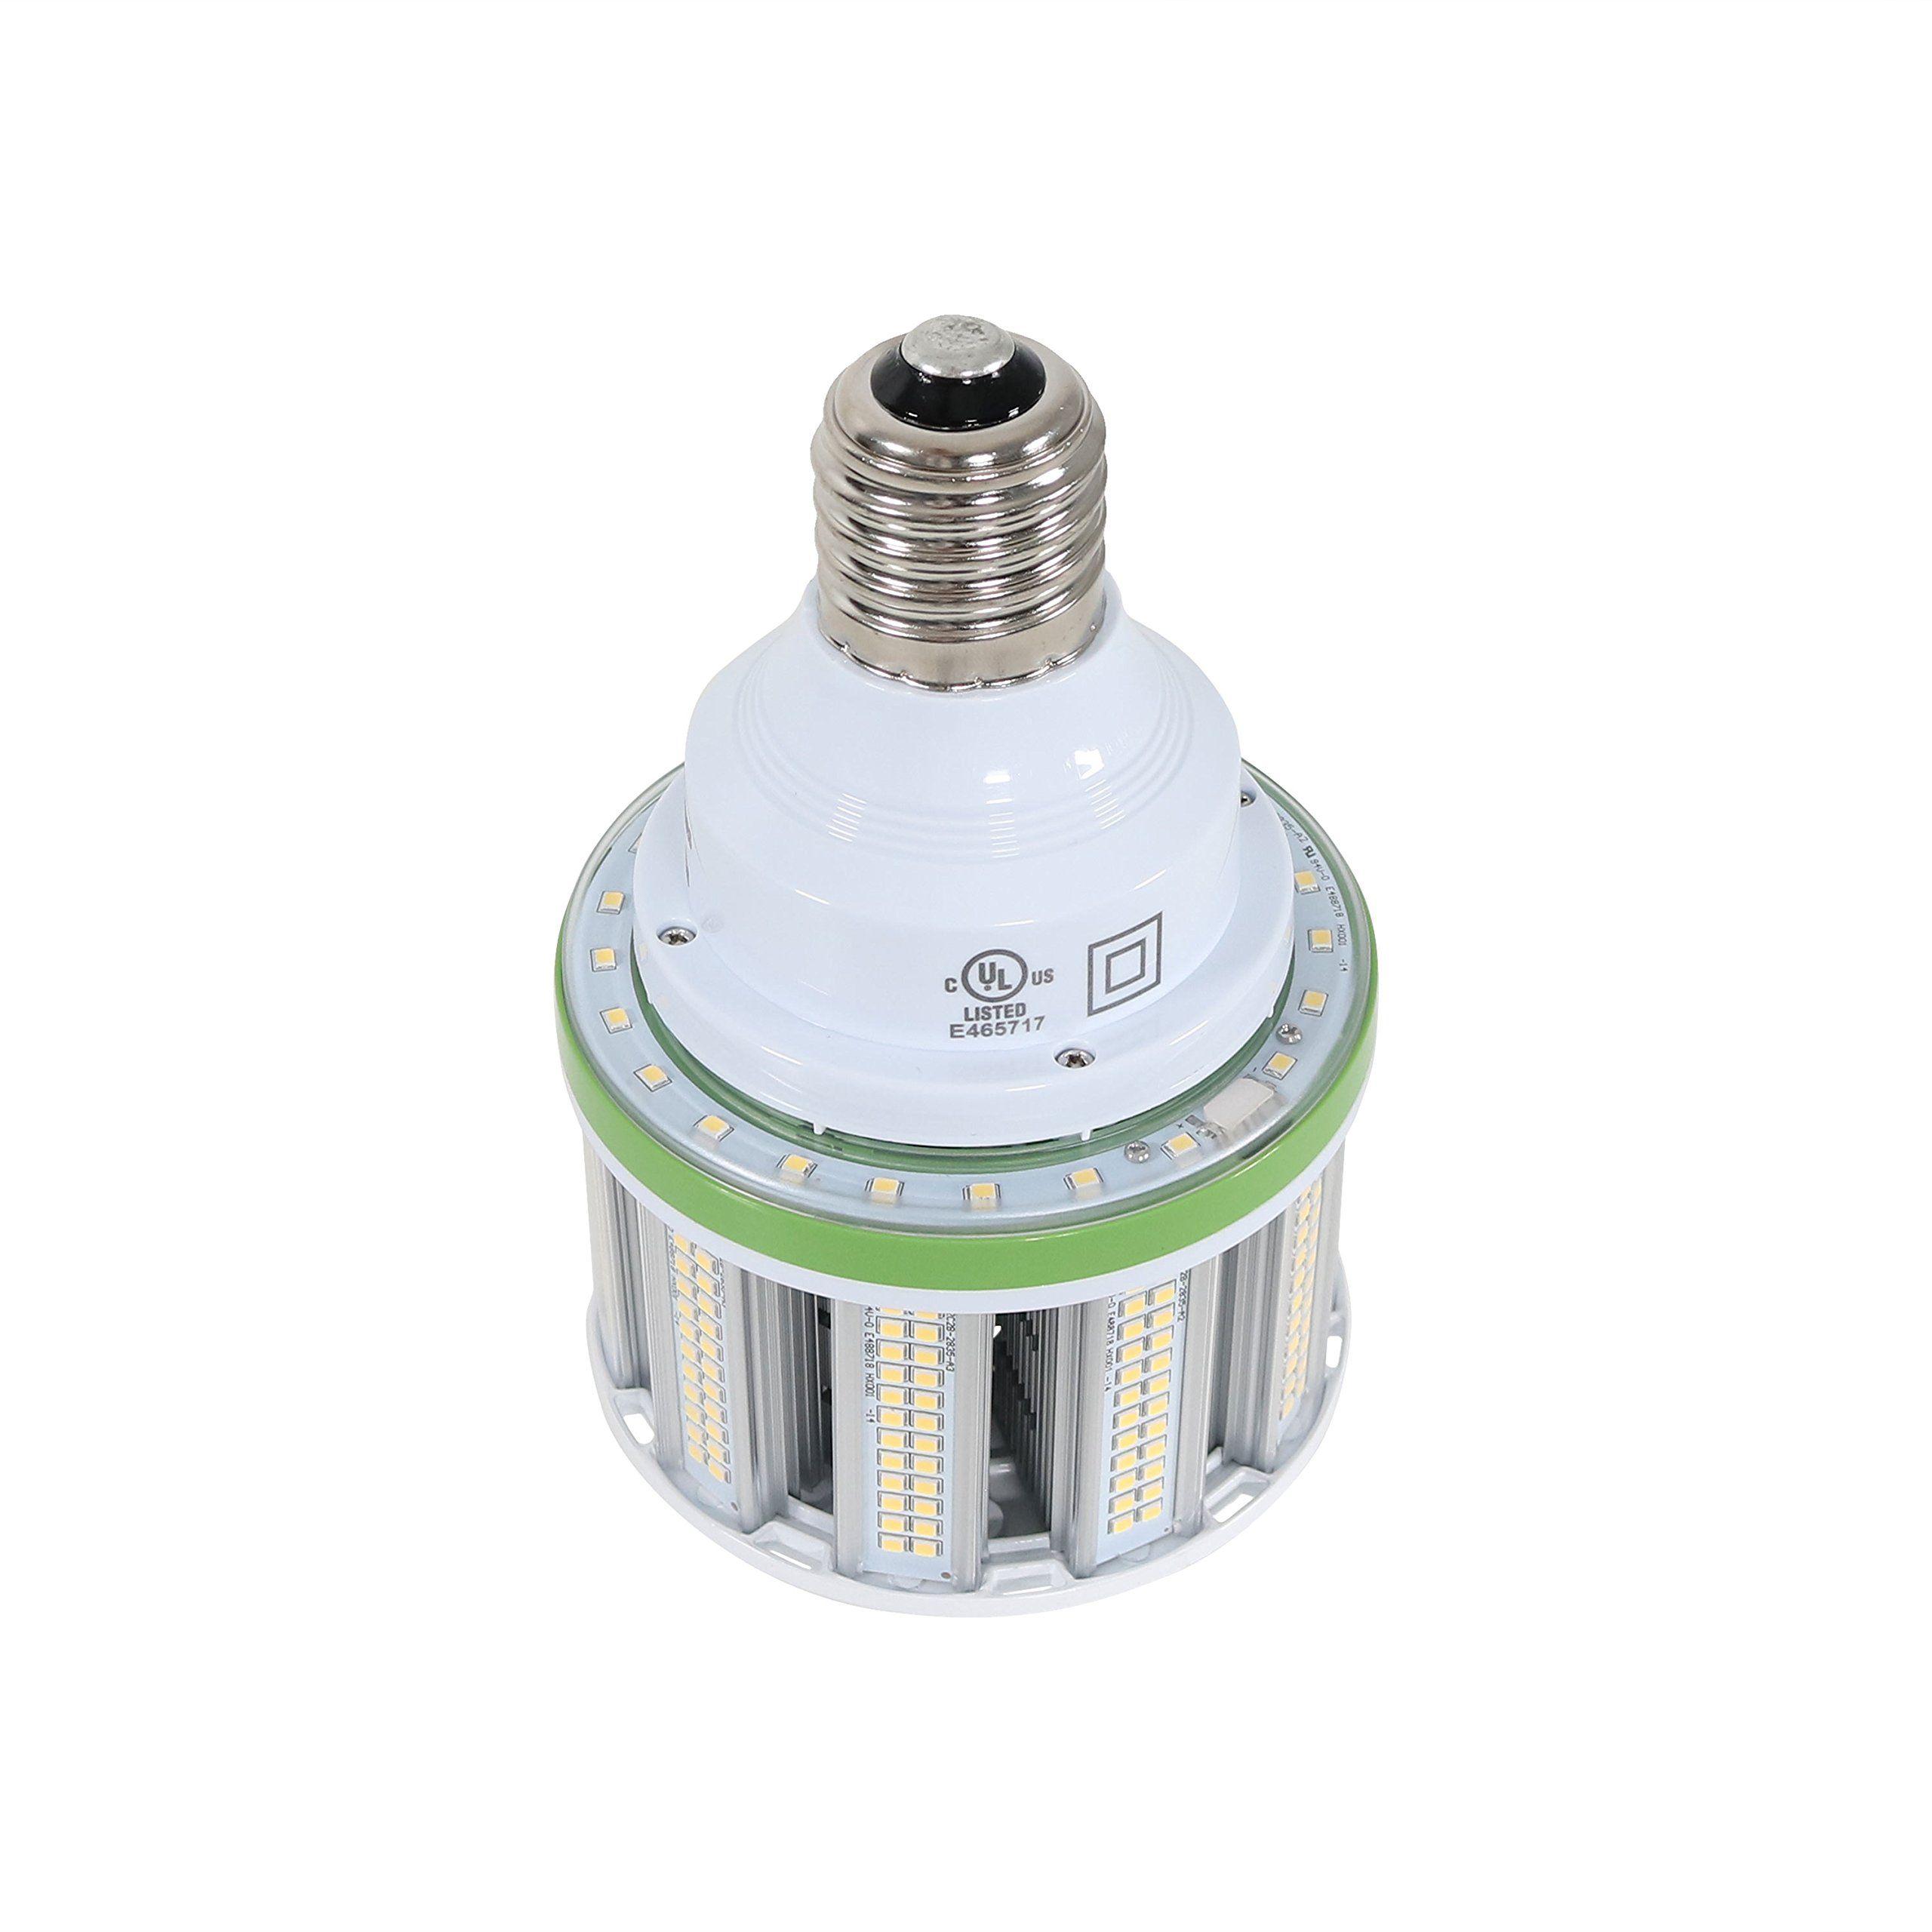 40w Watt Led Corn Light Bulb 5000k 5200 Lumens Mogul E39 Base Latest Gen Large Heat Sink For Garage High Bay Warehouse Workshop Sho Light Bulb Bulb Light Bulbs